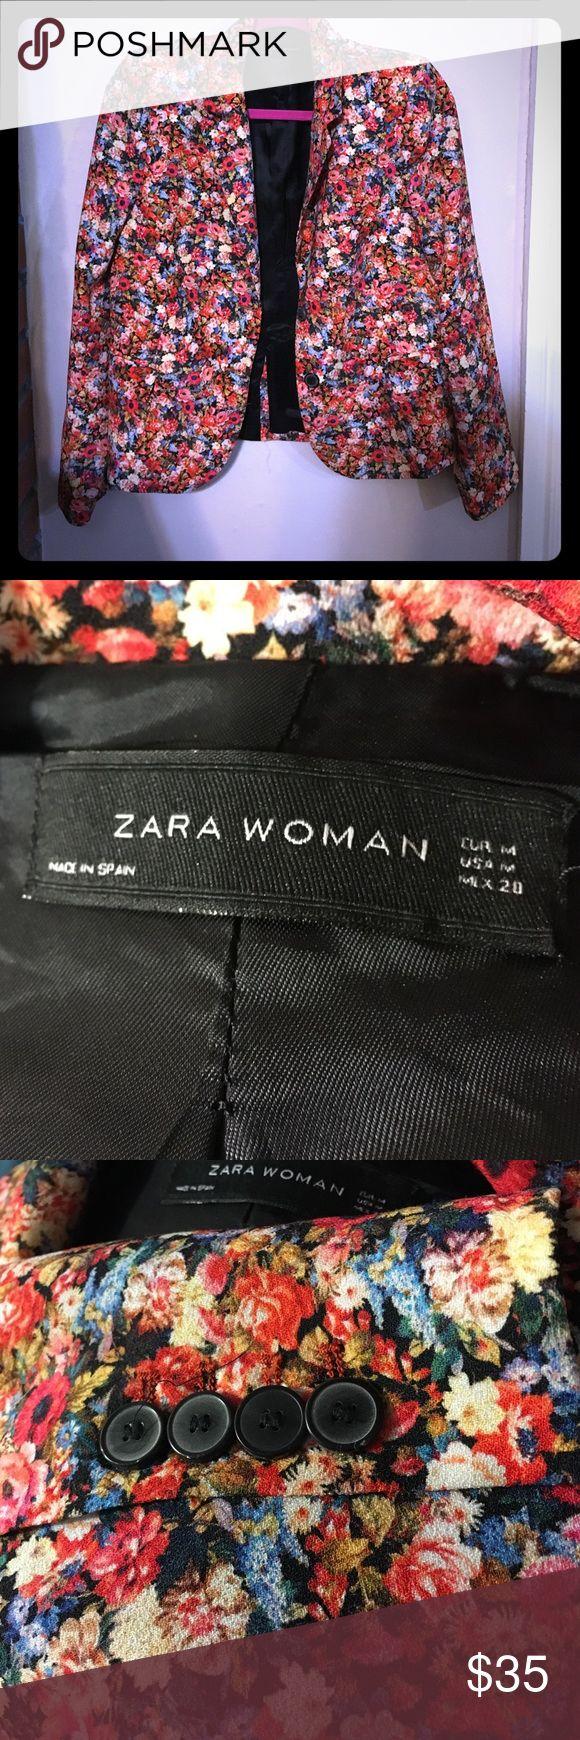 Zara Floral Printed Blazer Multi colored two button blazer with slight shoulder pad Zara Jackets & Coats Blazers